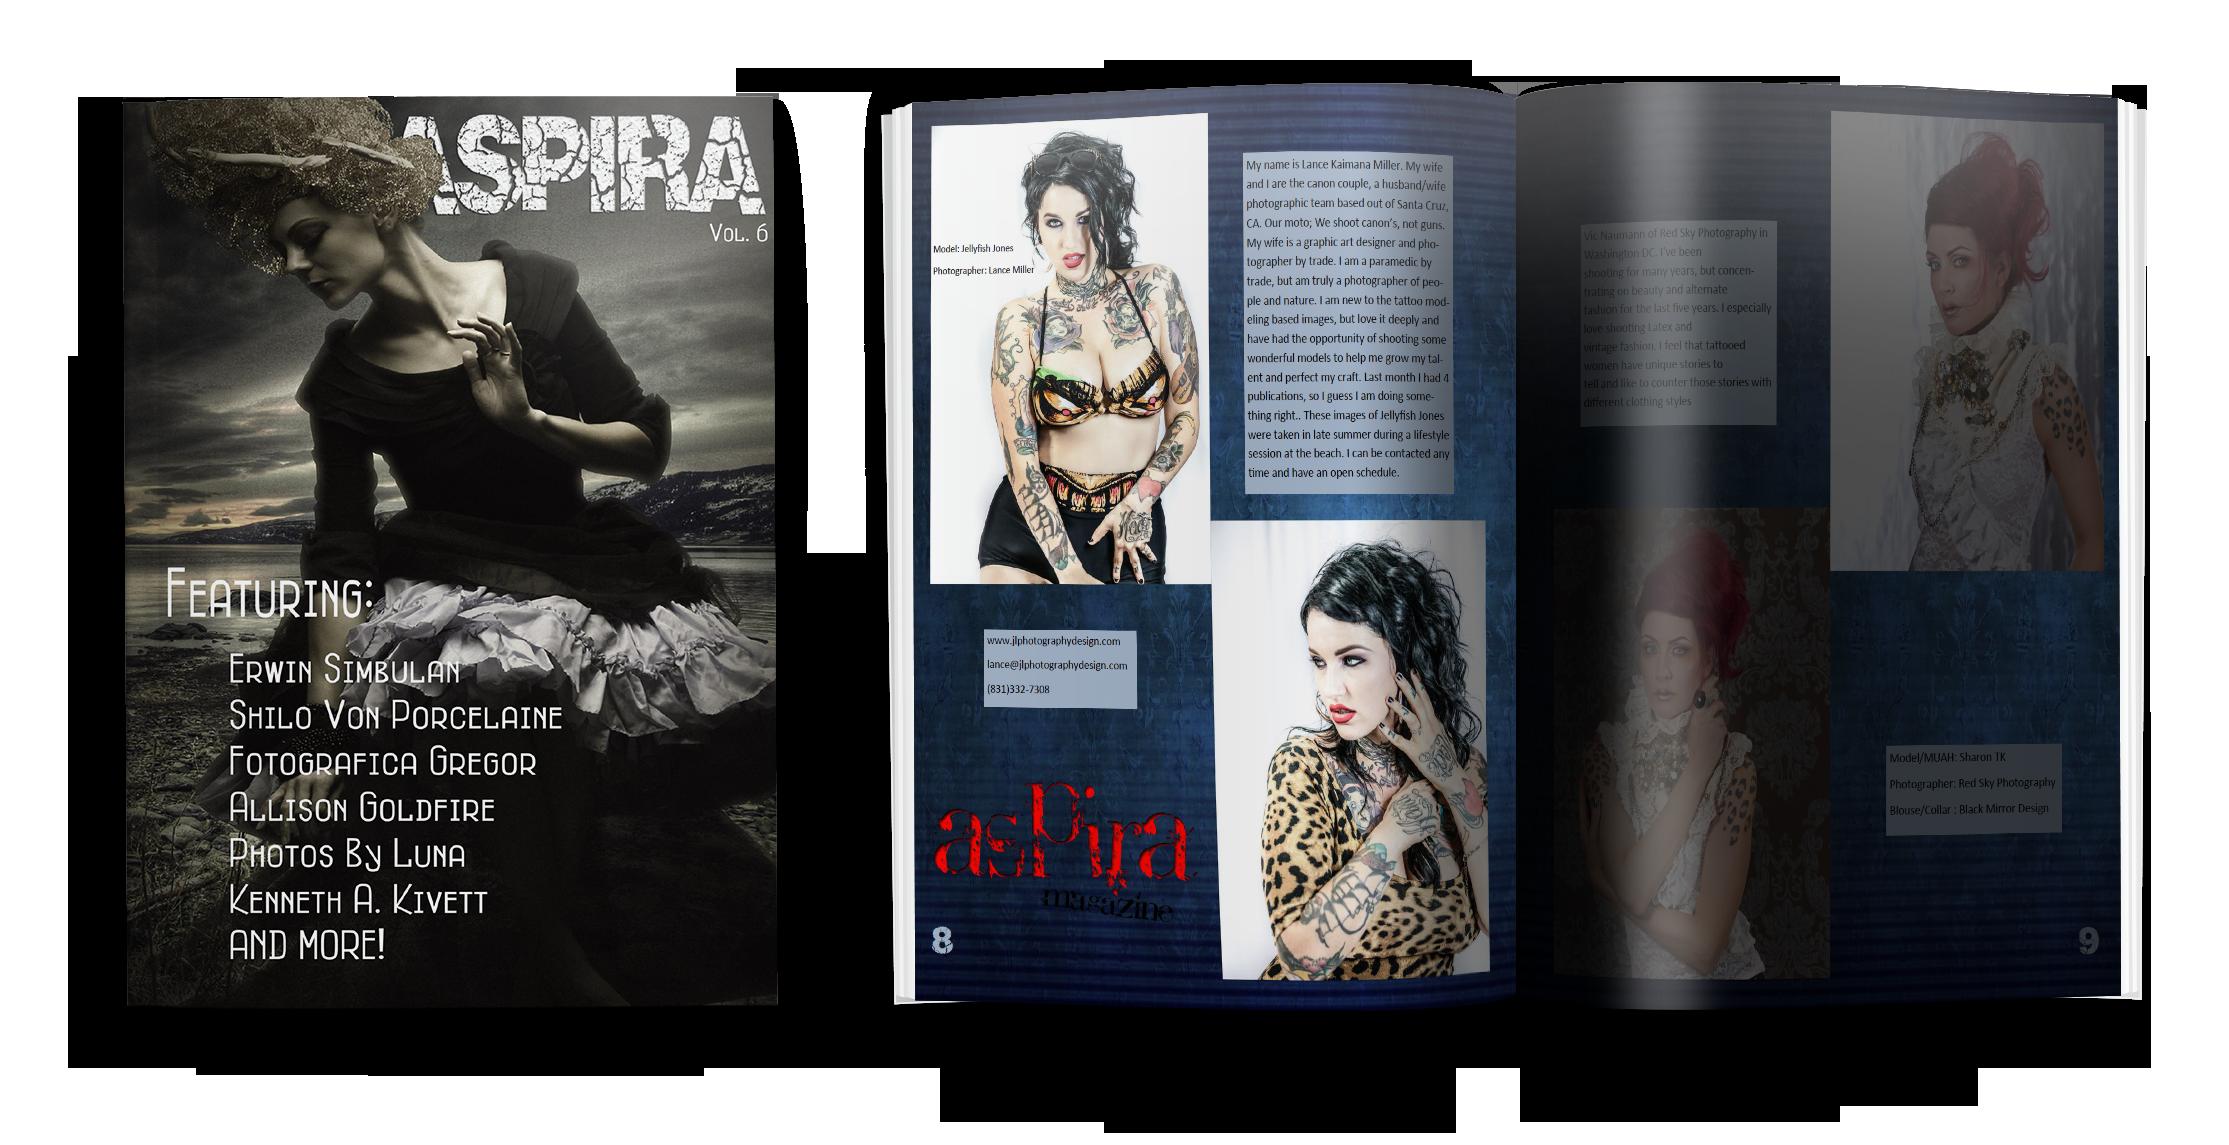 Other_Publications_Aspira_Magazine_Vol_6_Render1.png